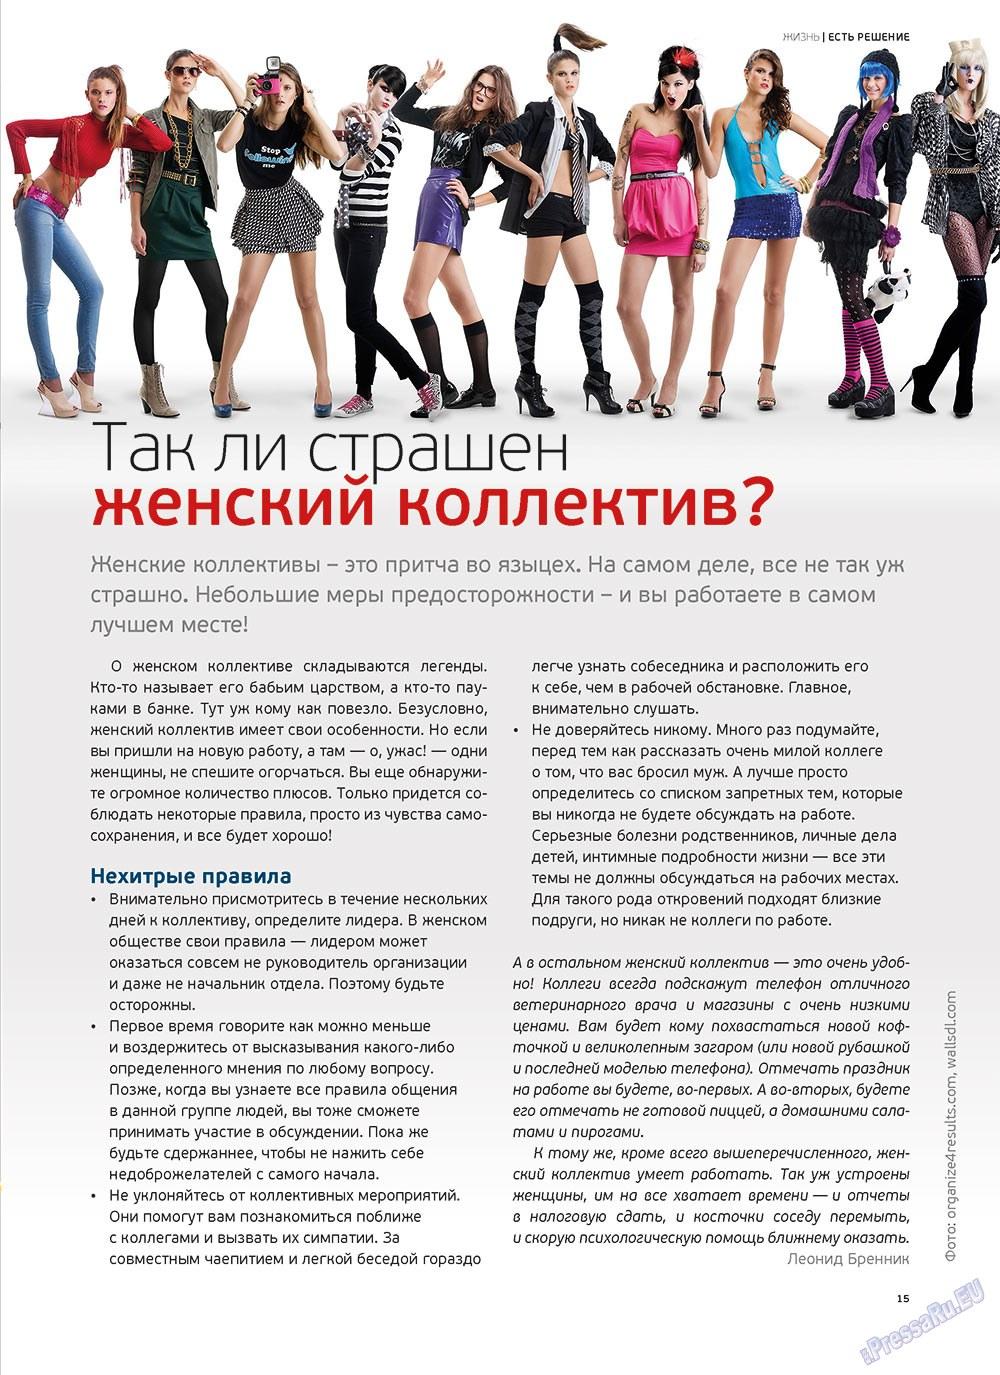 Артек (журнал). 2012 год, номер 5, стр. 17